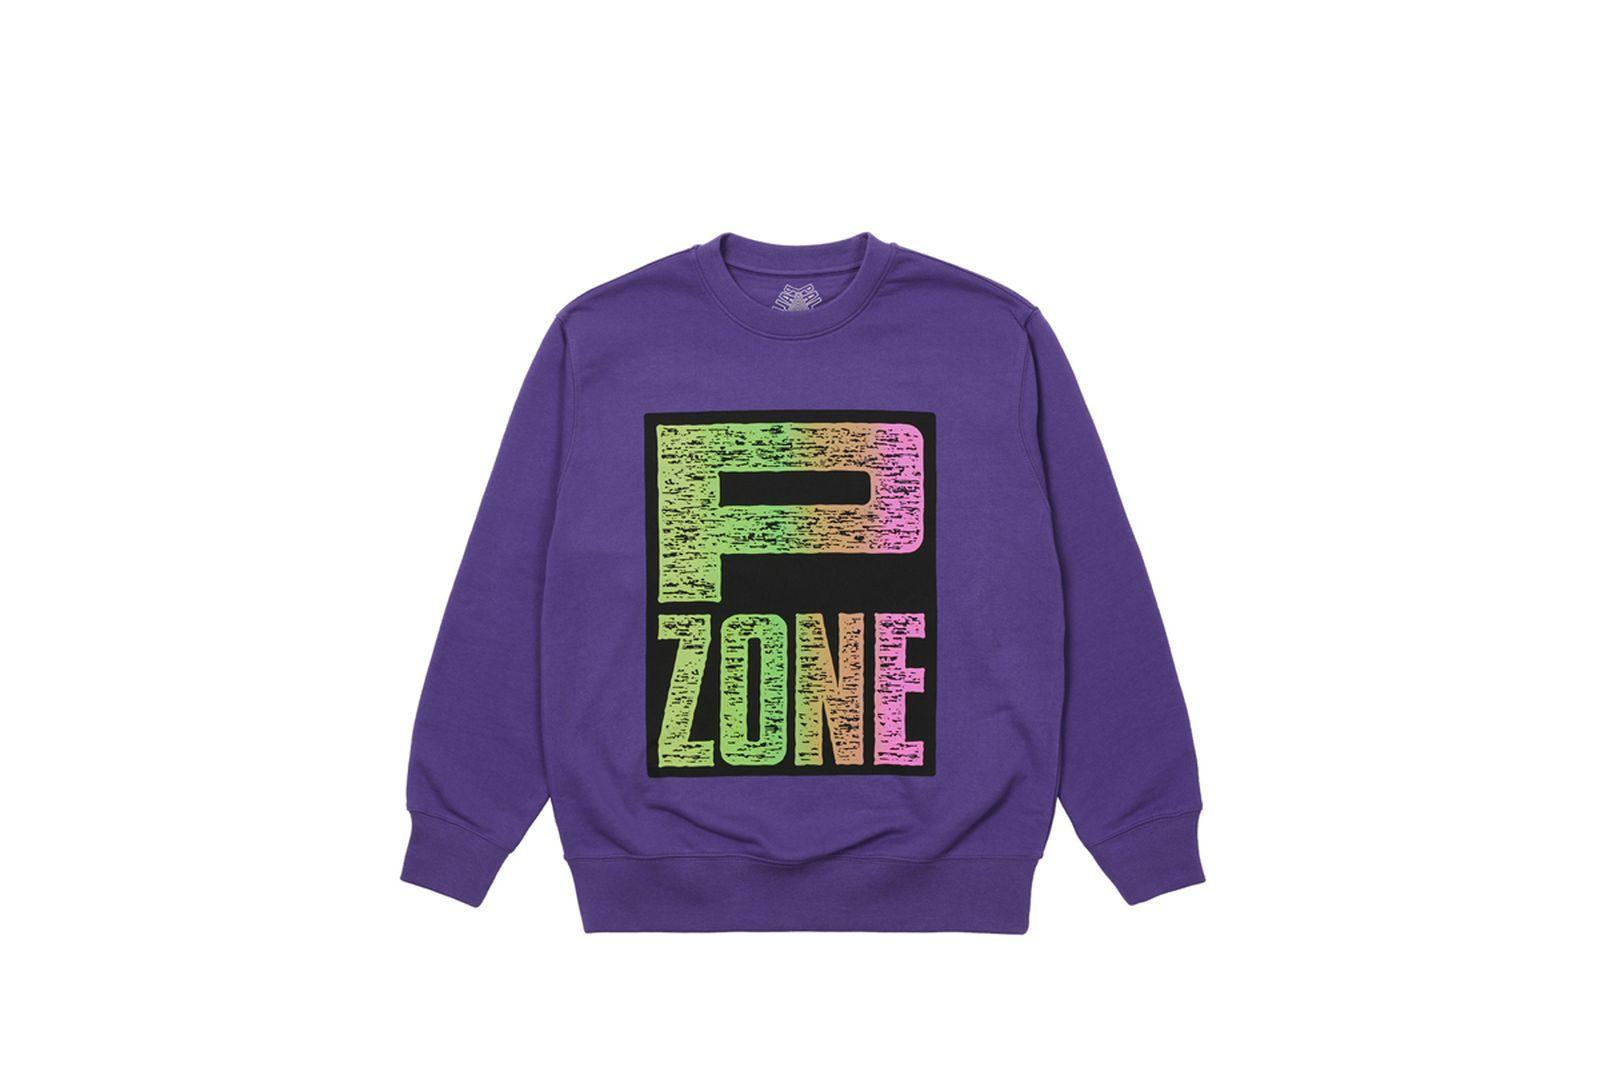 palace-m-zone-ss21-collaboration- (3)